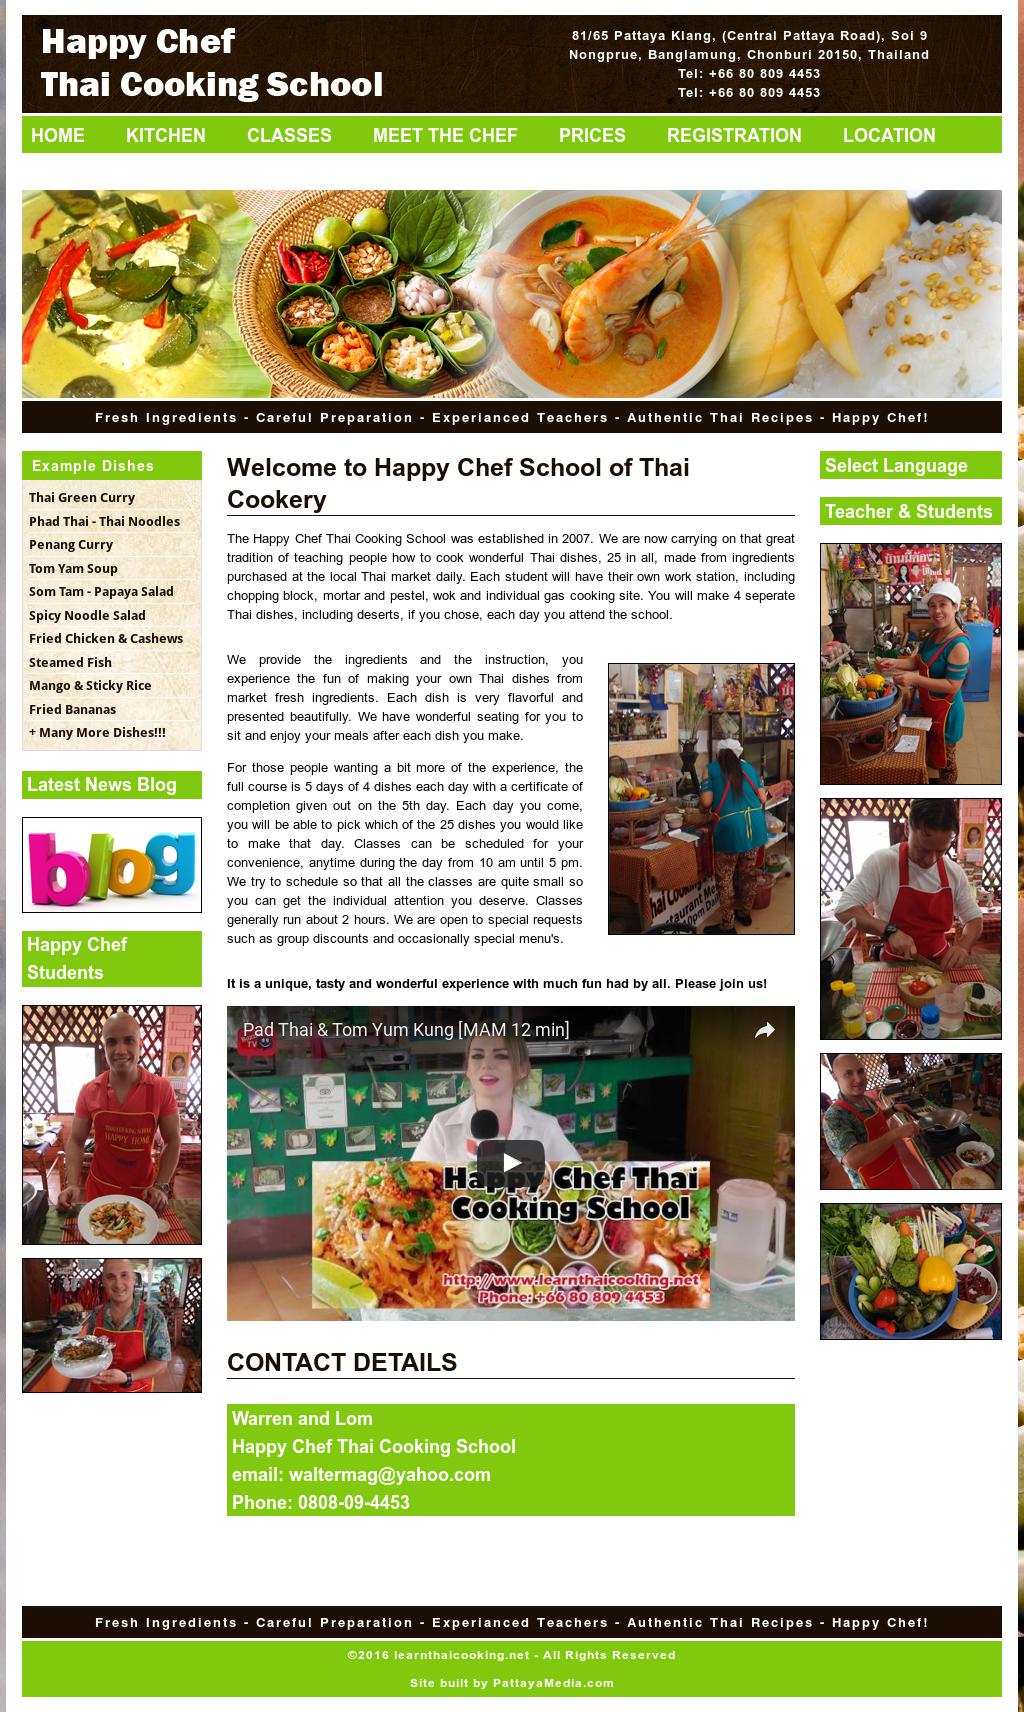 Happy Chef Thai Cooking School Competitors, Revenue and